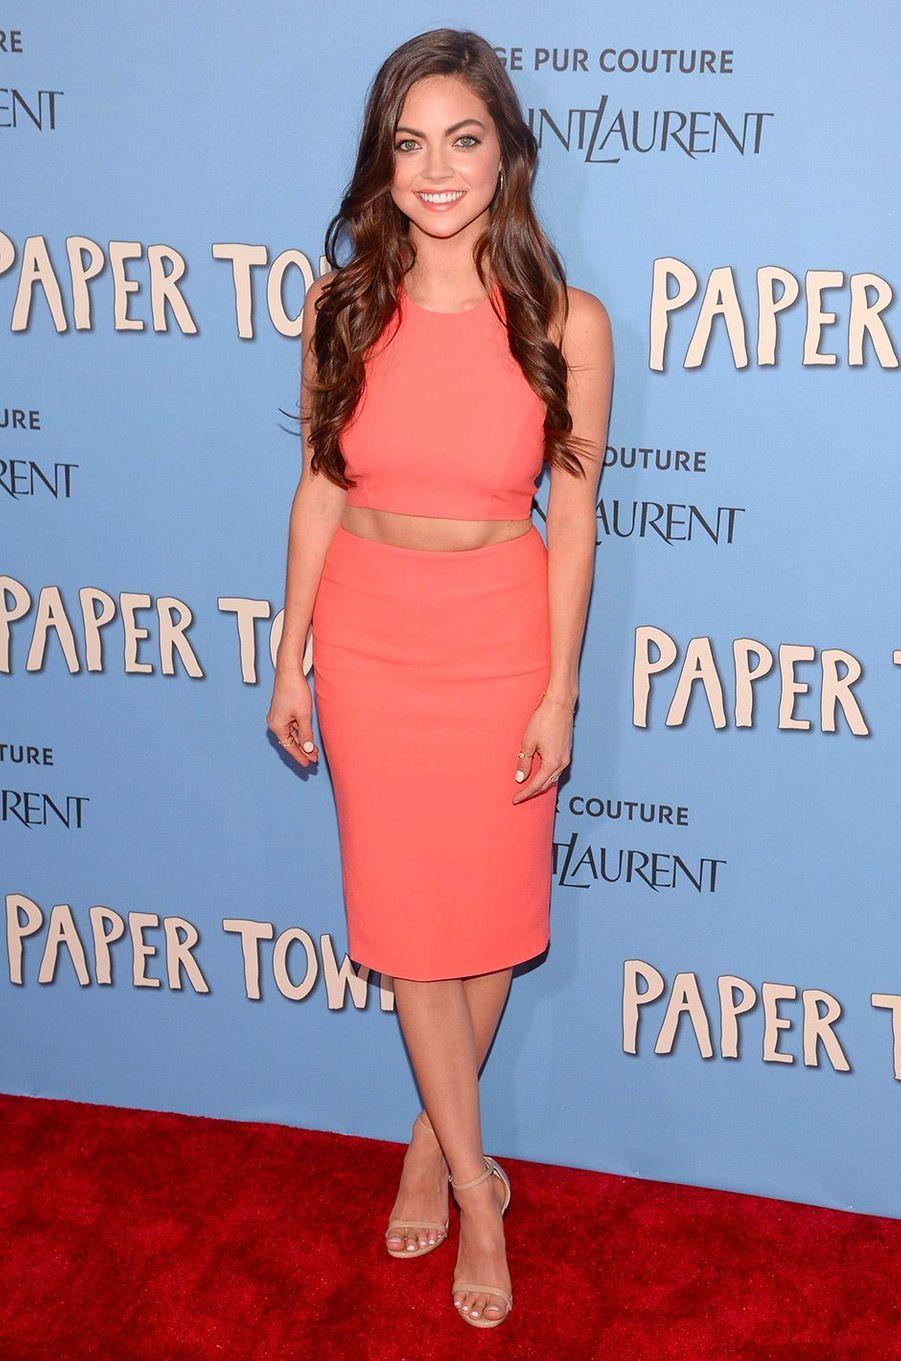 Caitlin Carver en juillet 2015